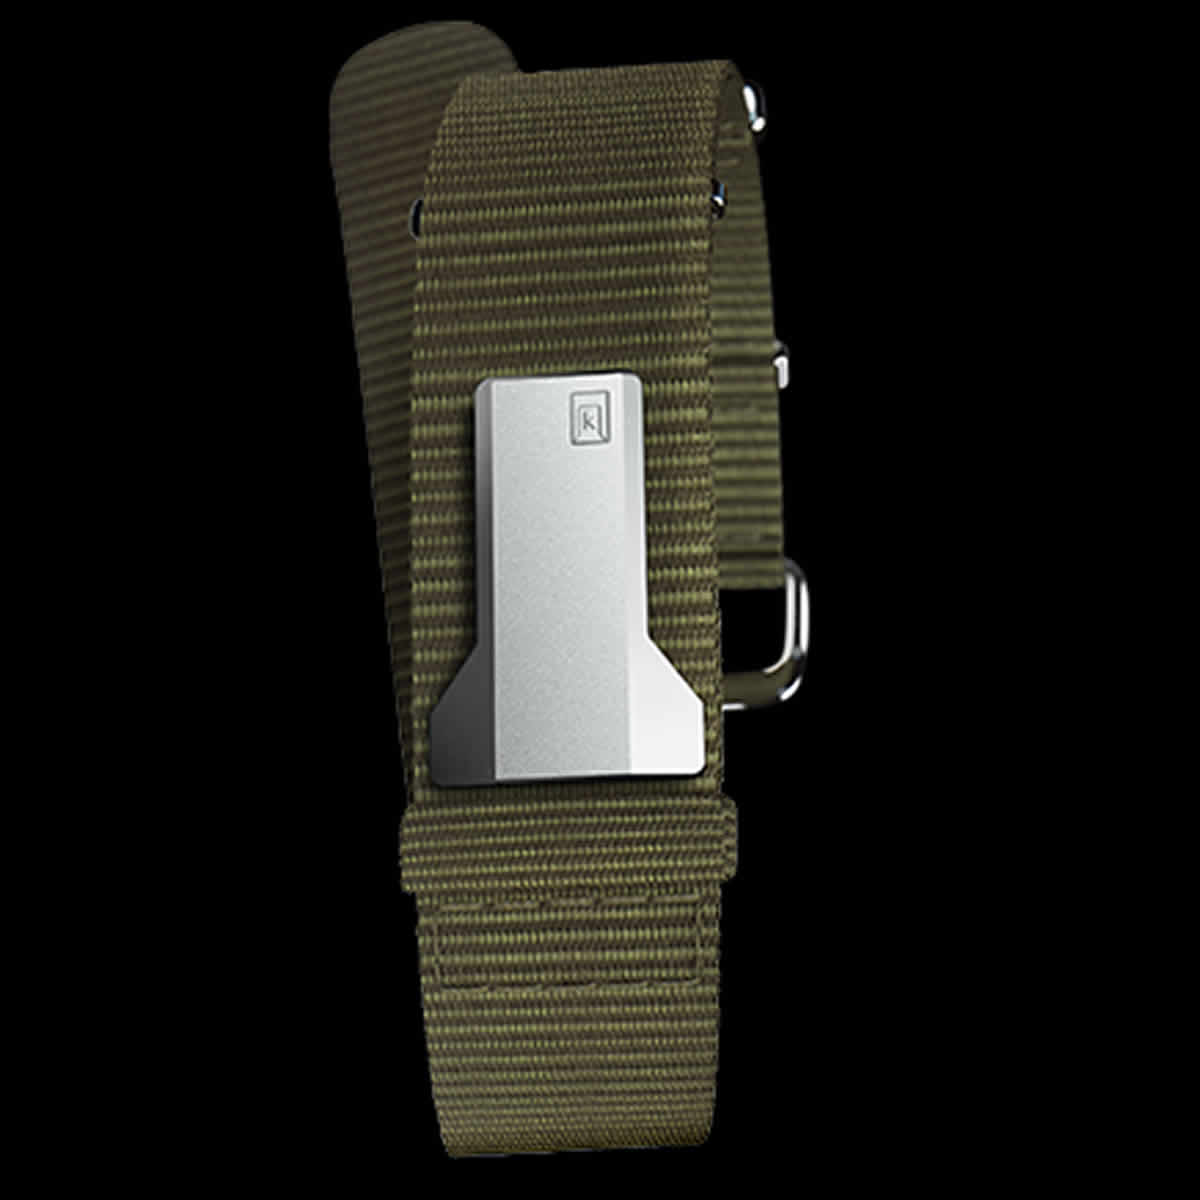 klokers(クロッカーズ) 腕時計用ベルト オレンジ ストラップ Vert Amande (ヴェール・アマンド)